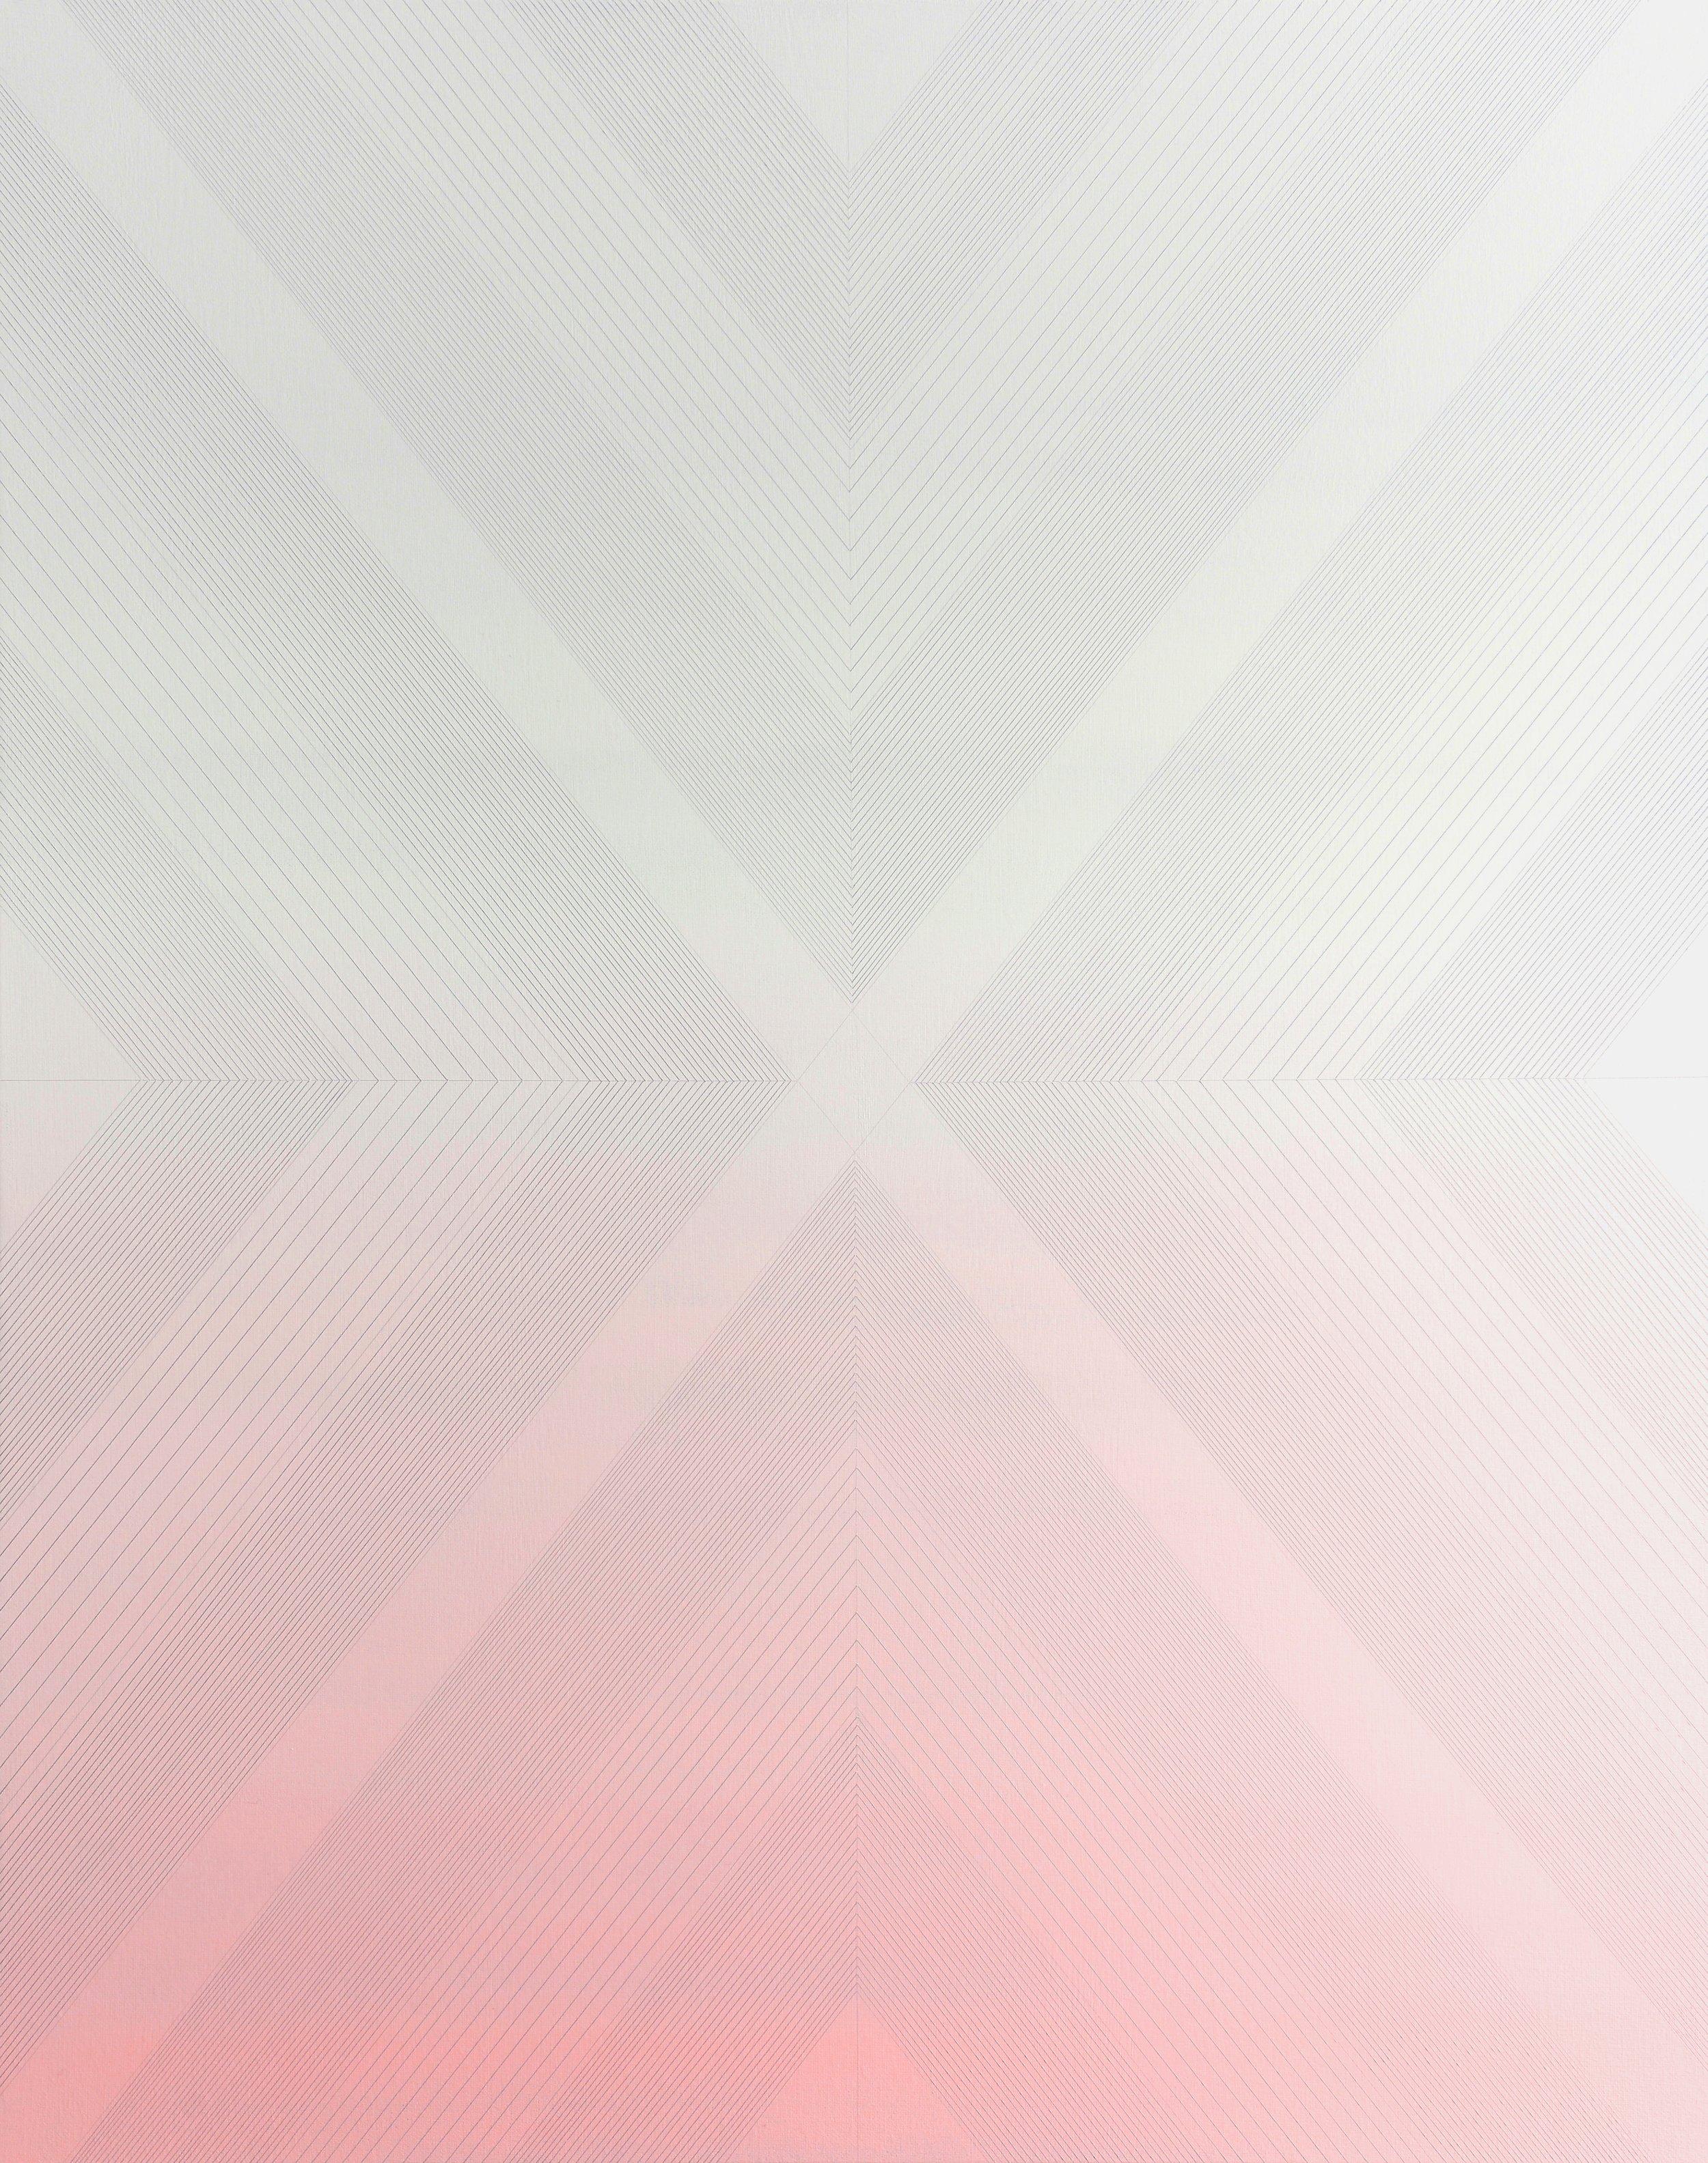 X(2), 2017